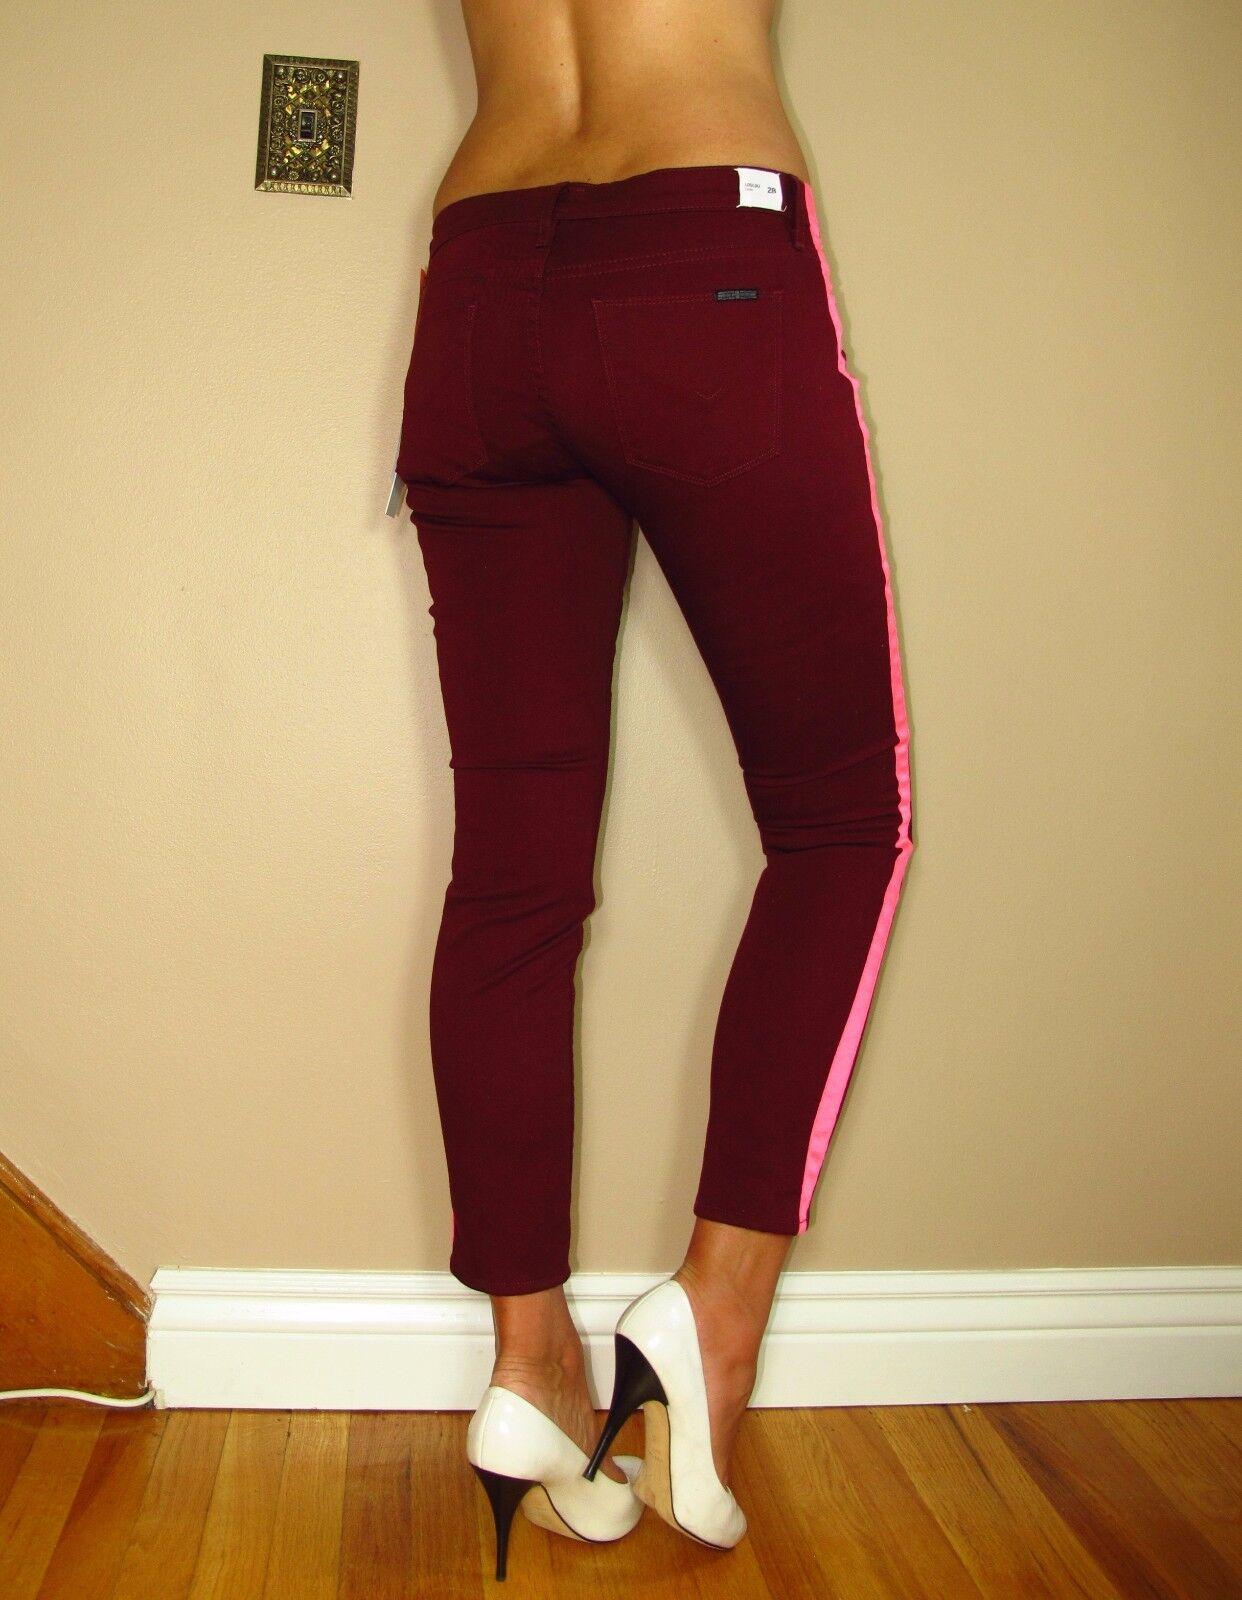 Hudson  187 Loulou Dark Red Hot Pink Tuxedo Stripe Skinny Low Rise Crop Jeans 29